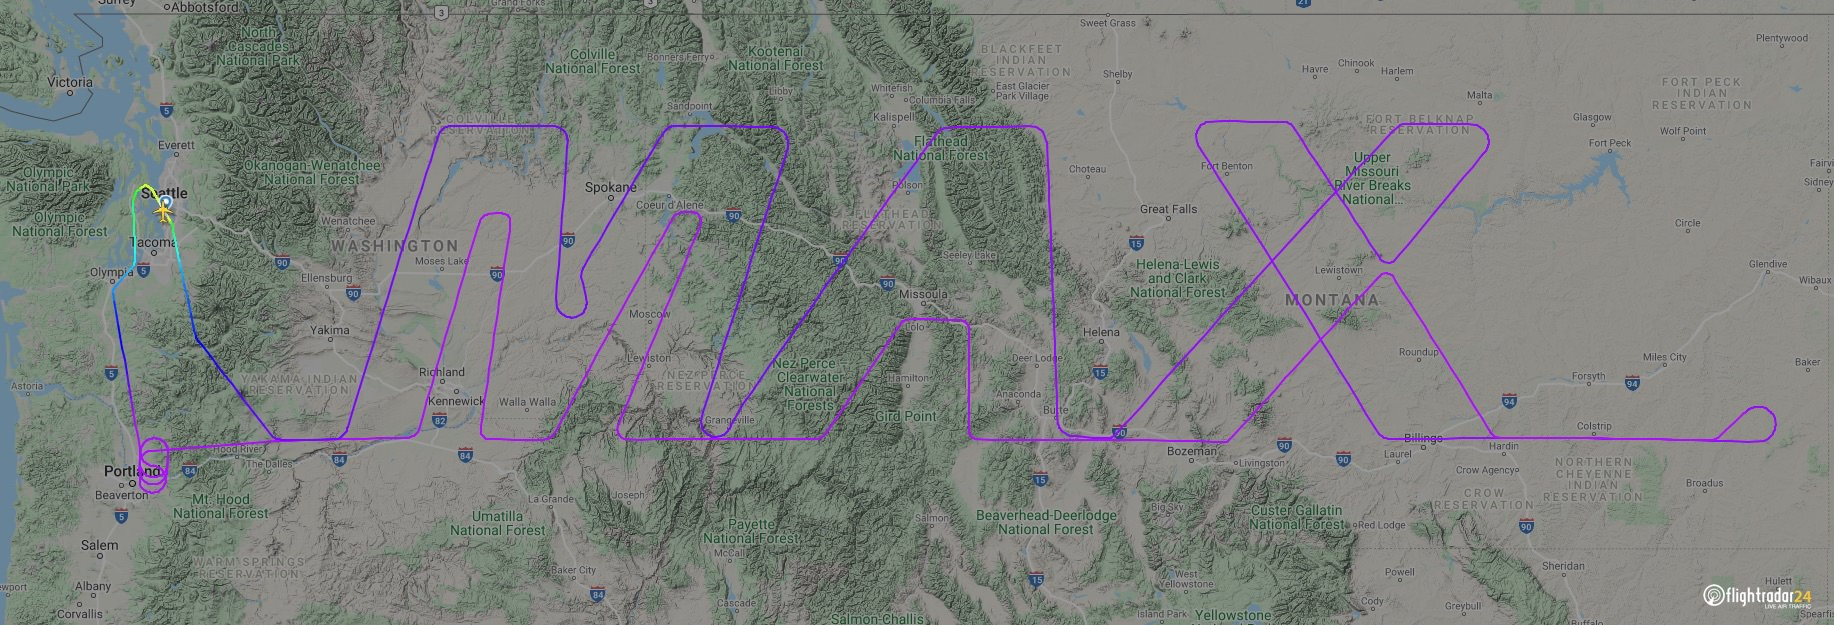 737 MAX writes MAX